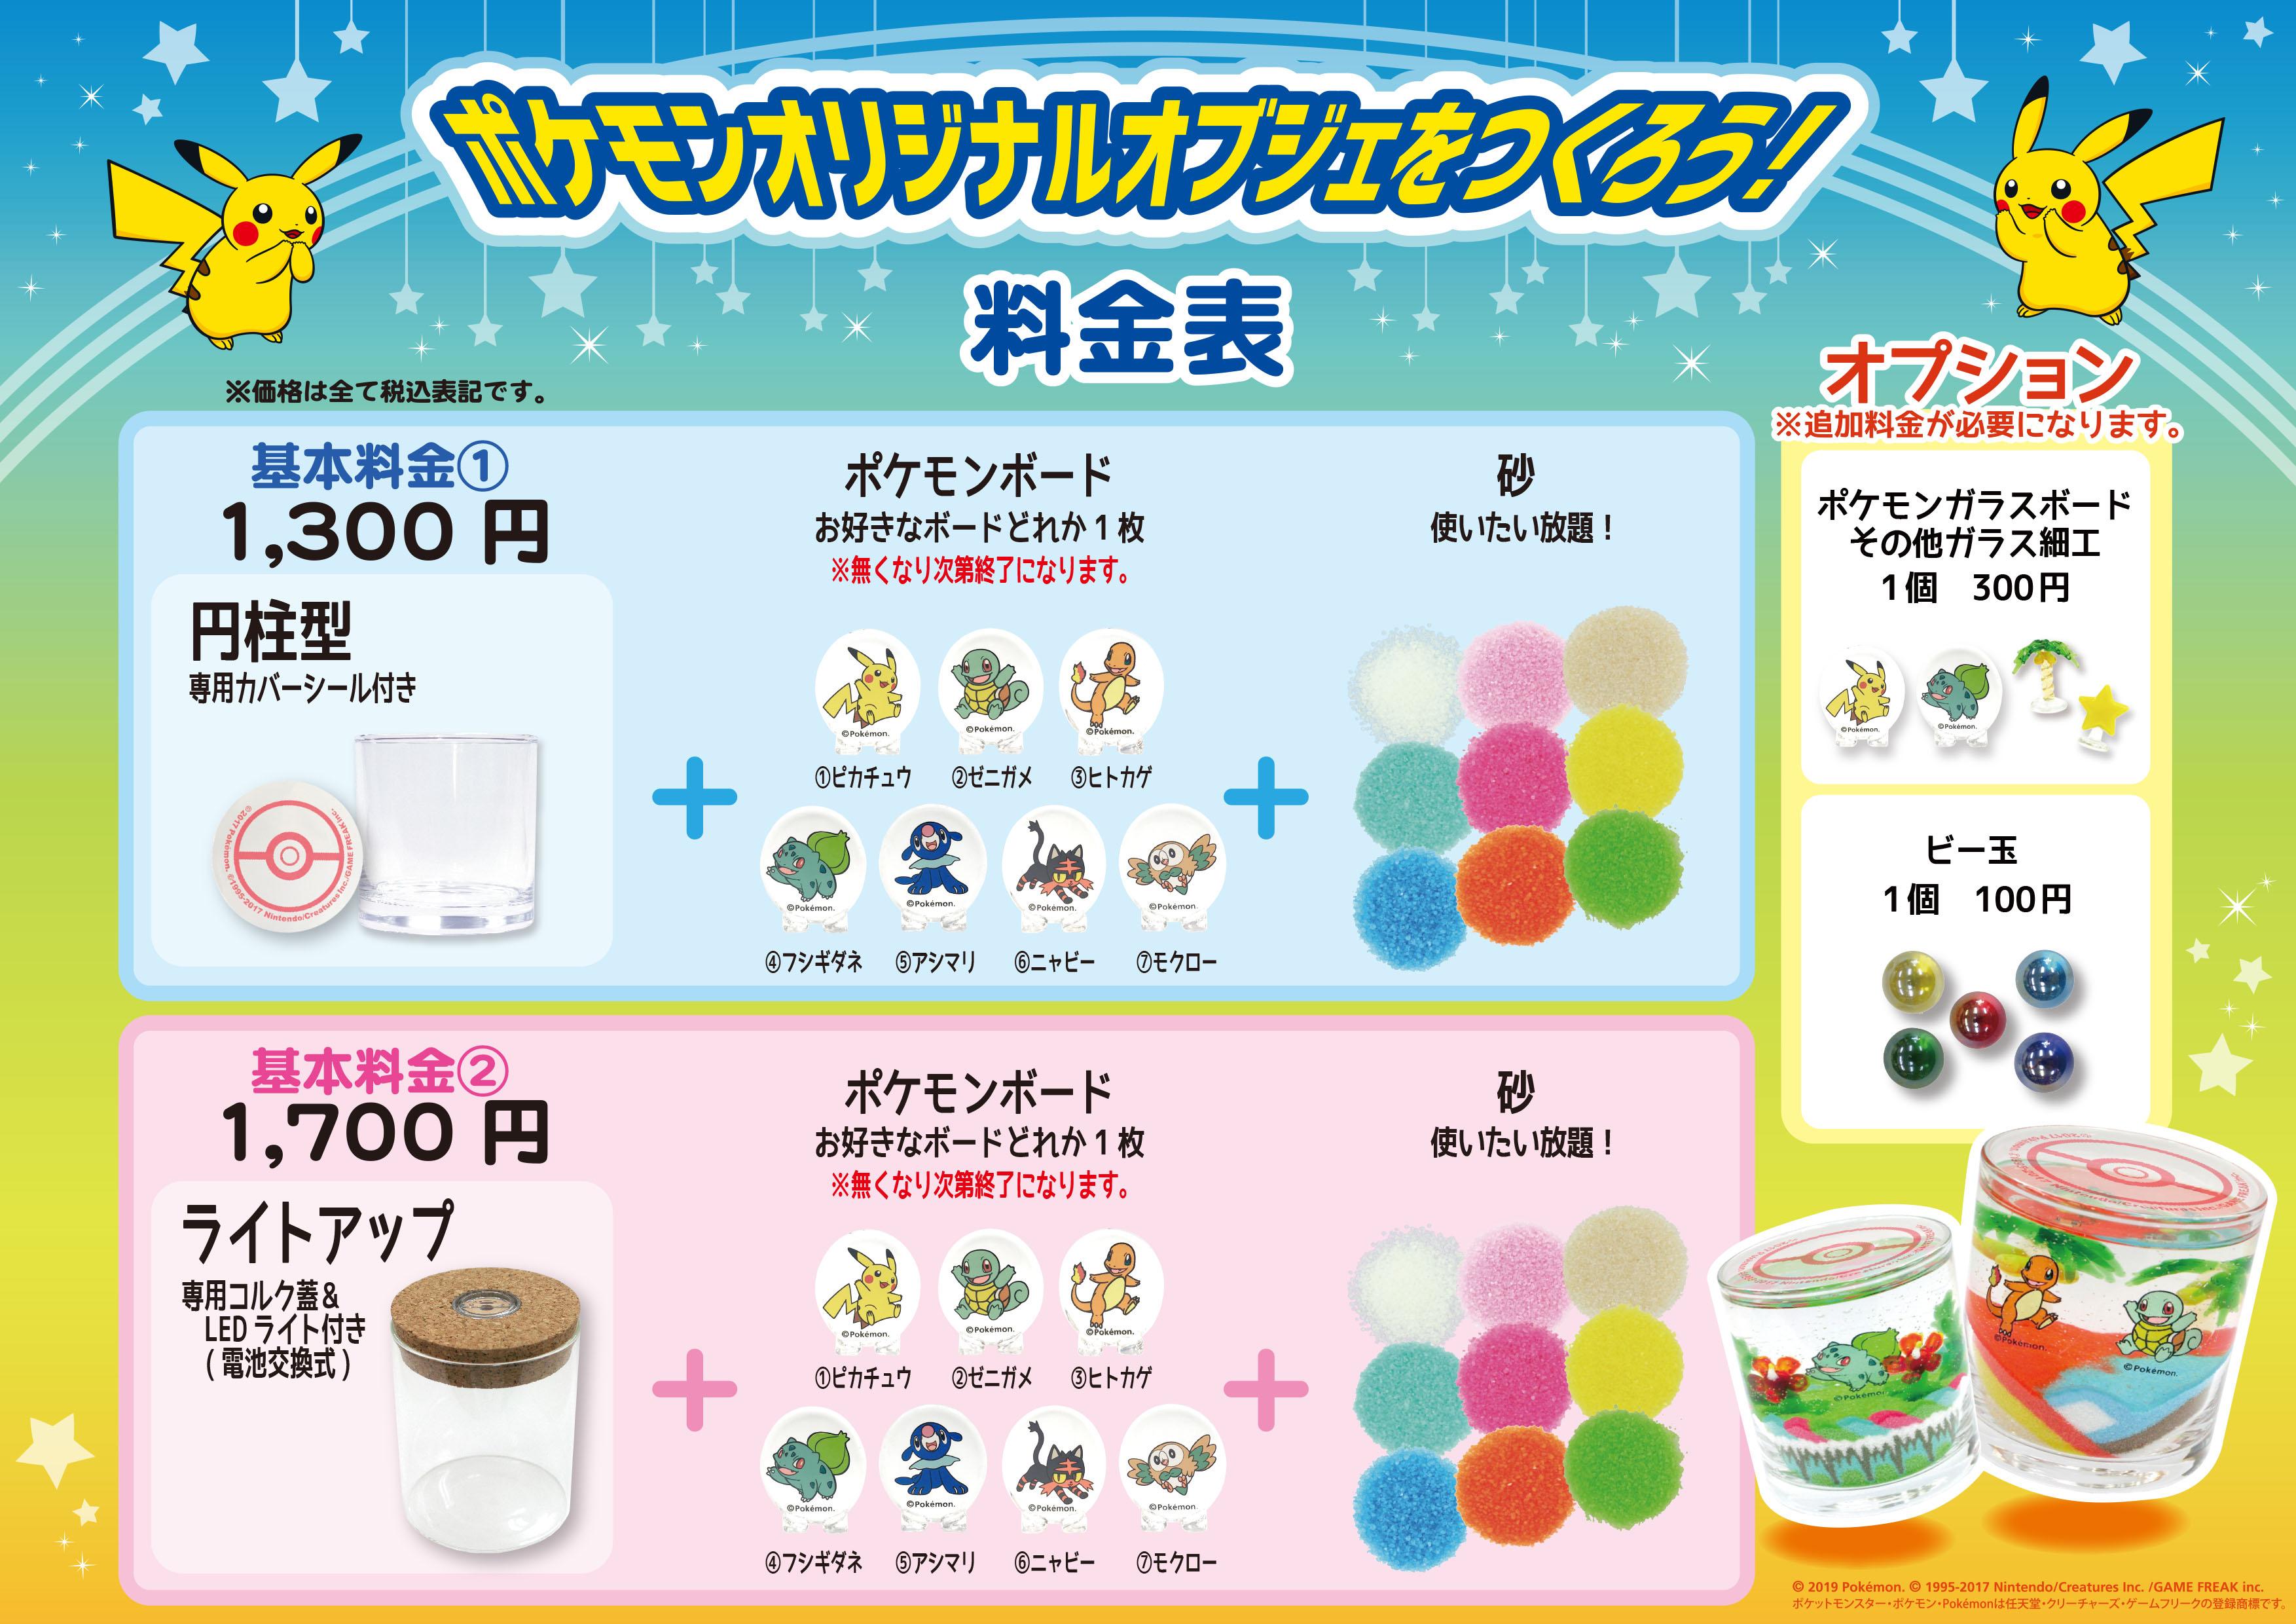 https://voice.pokemon.co.jp/stv/nagoya/02_%E6%96%99%E9%87%91%E8%A1%A8.jpg